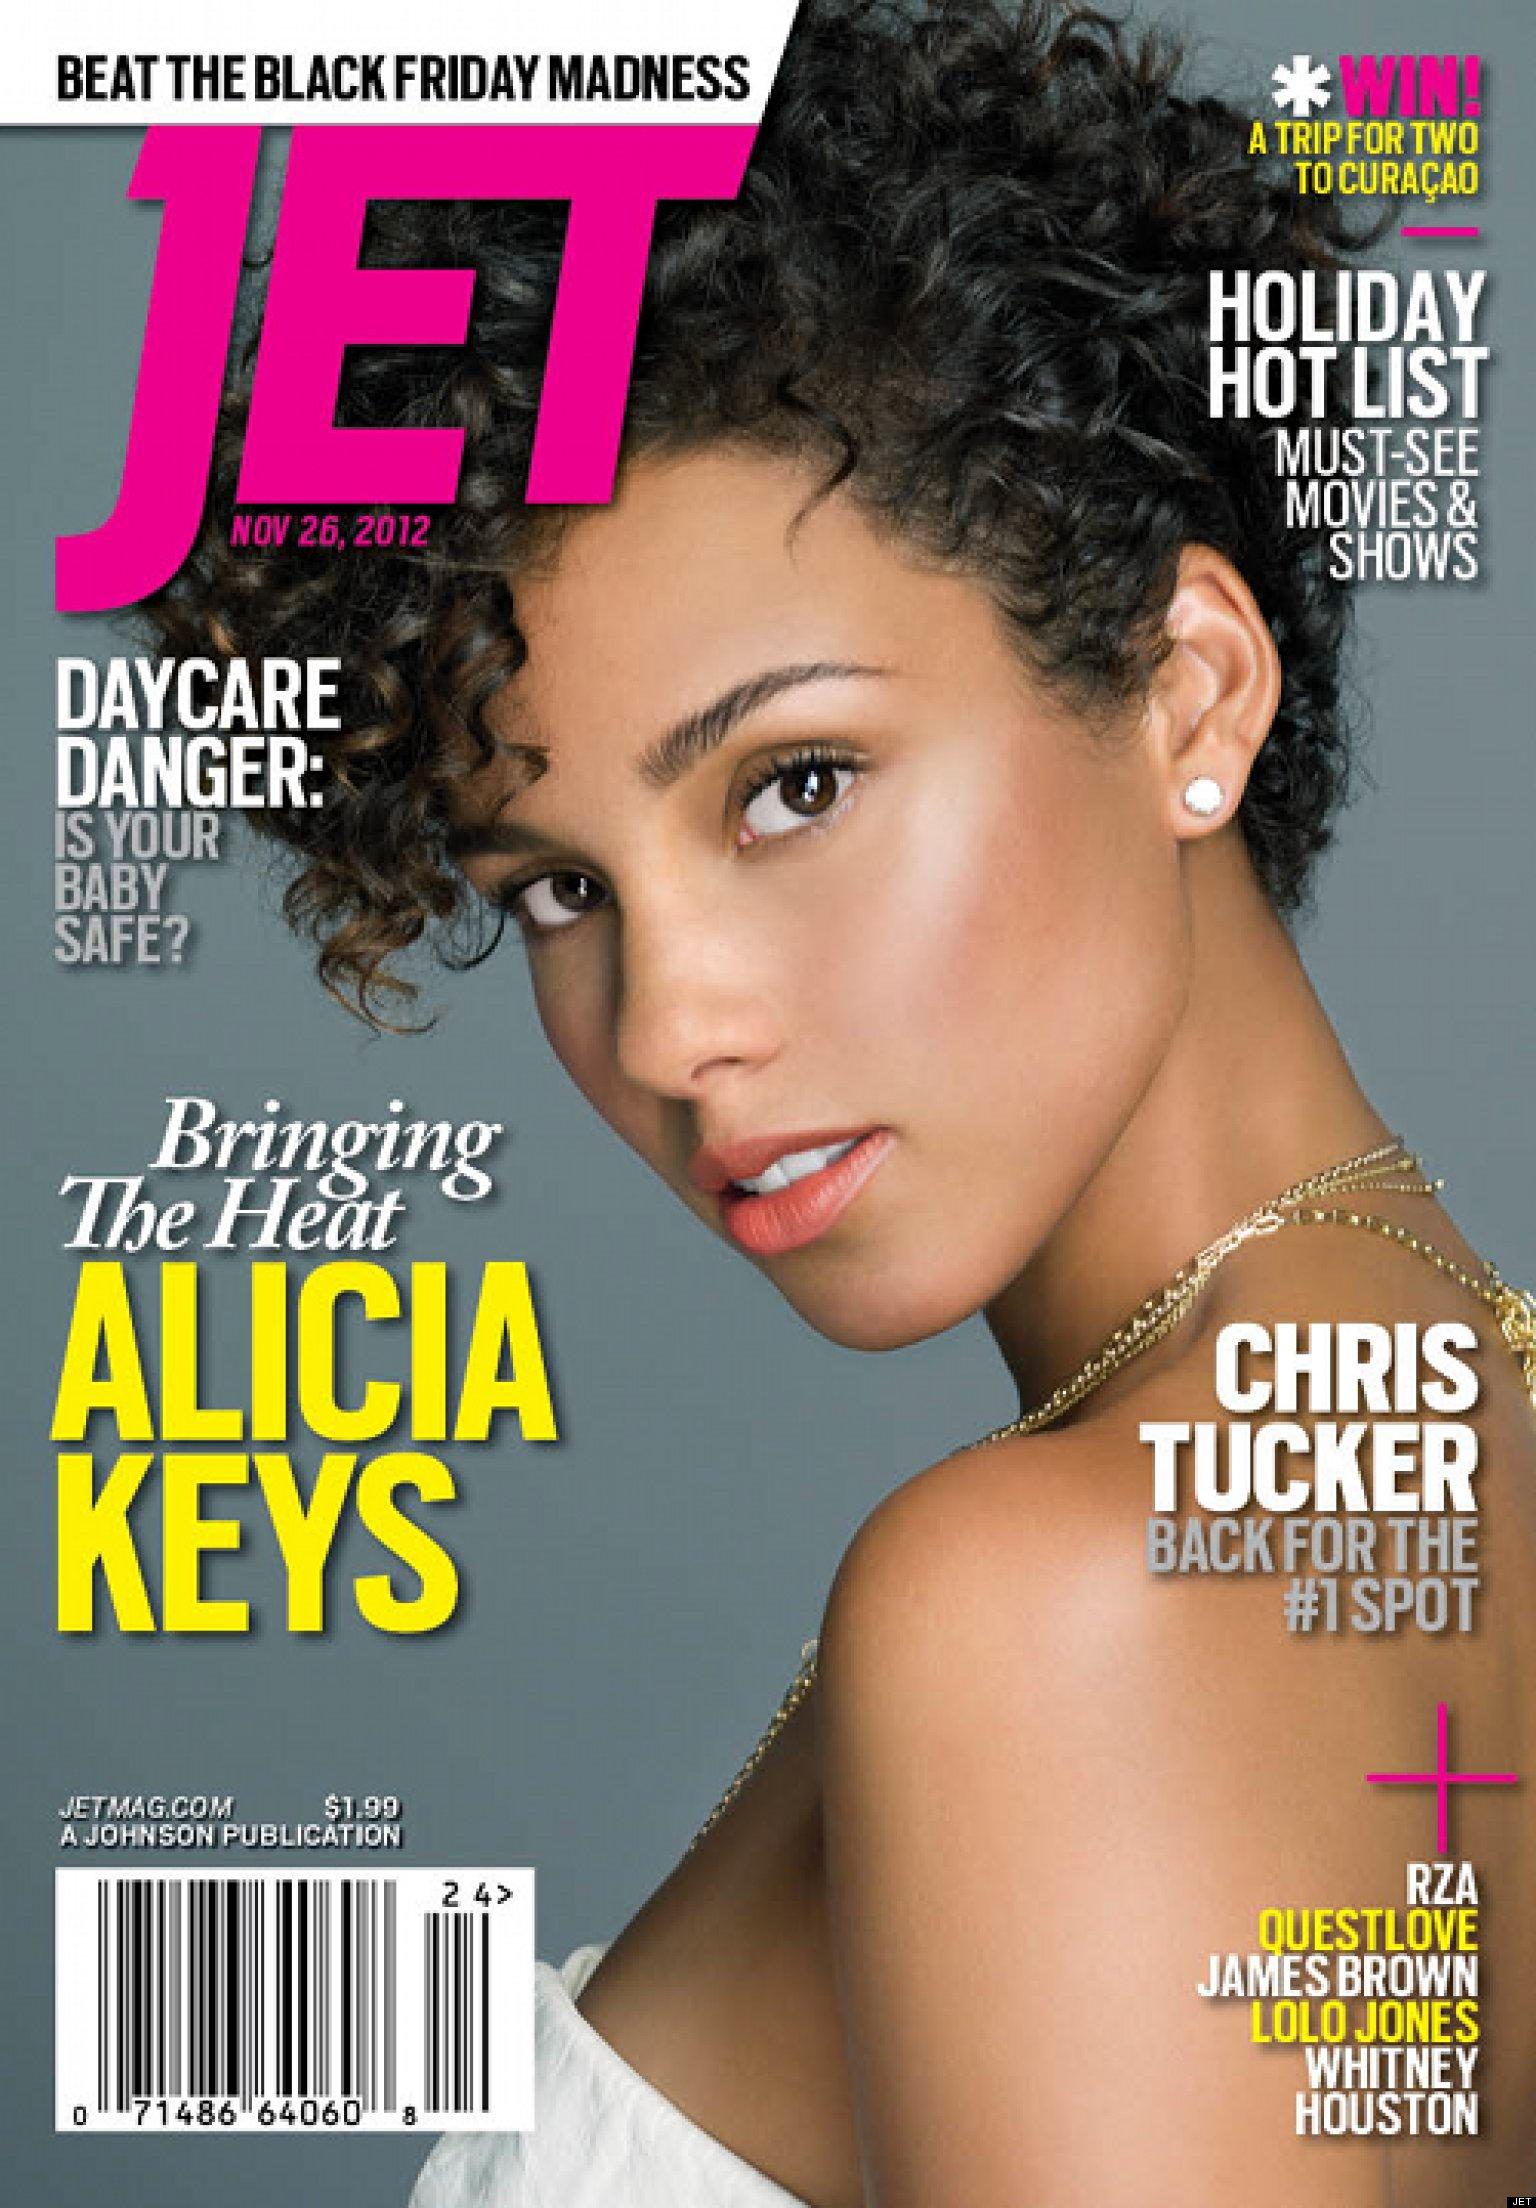 Alicia Keys Responds To Premarital Rumors: Notable/Quotable